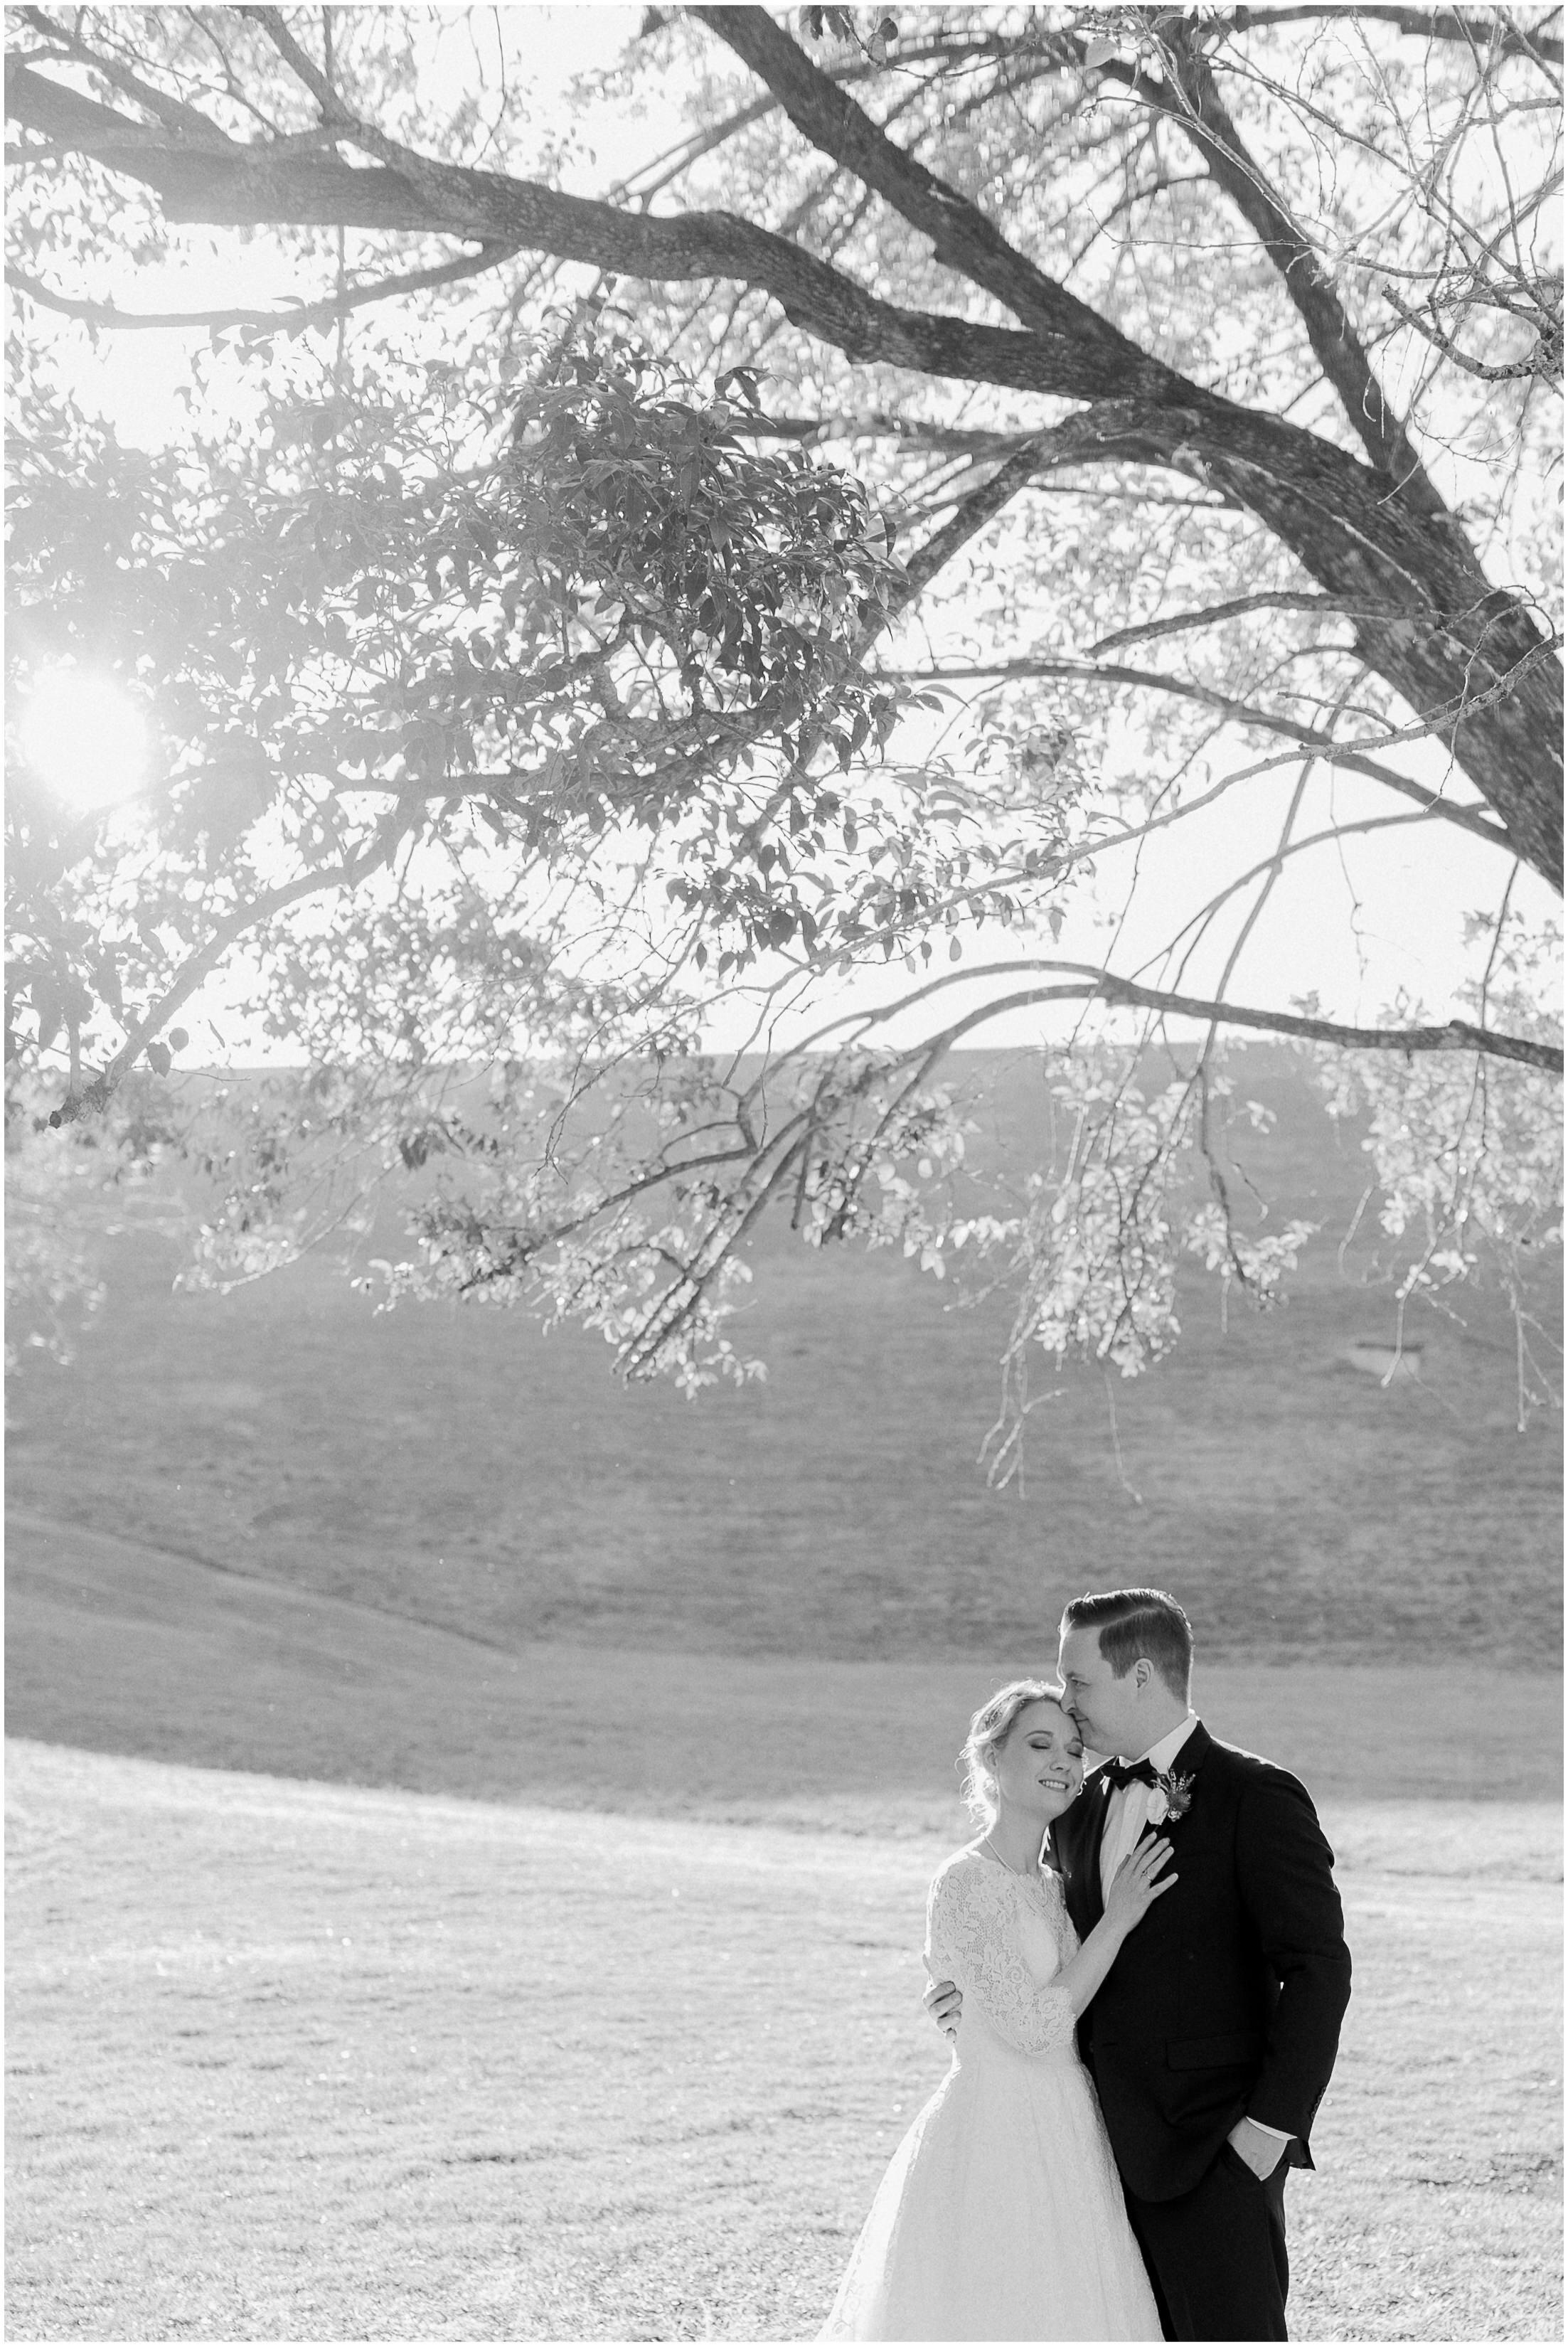 brisbane-fine-art-wedding-photographer-lauren-olivia-luxury-wedding-australia-19.jpg